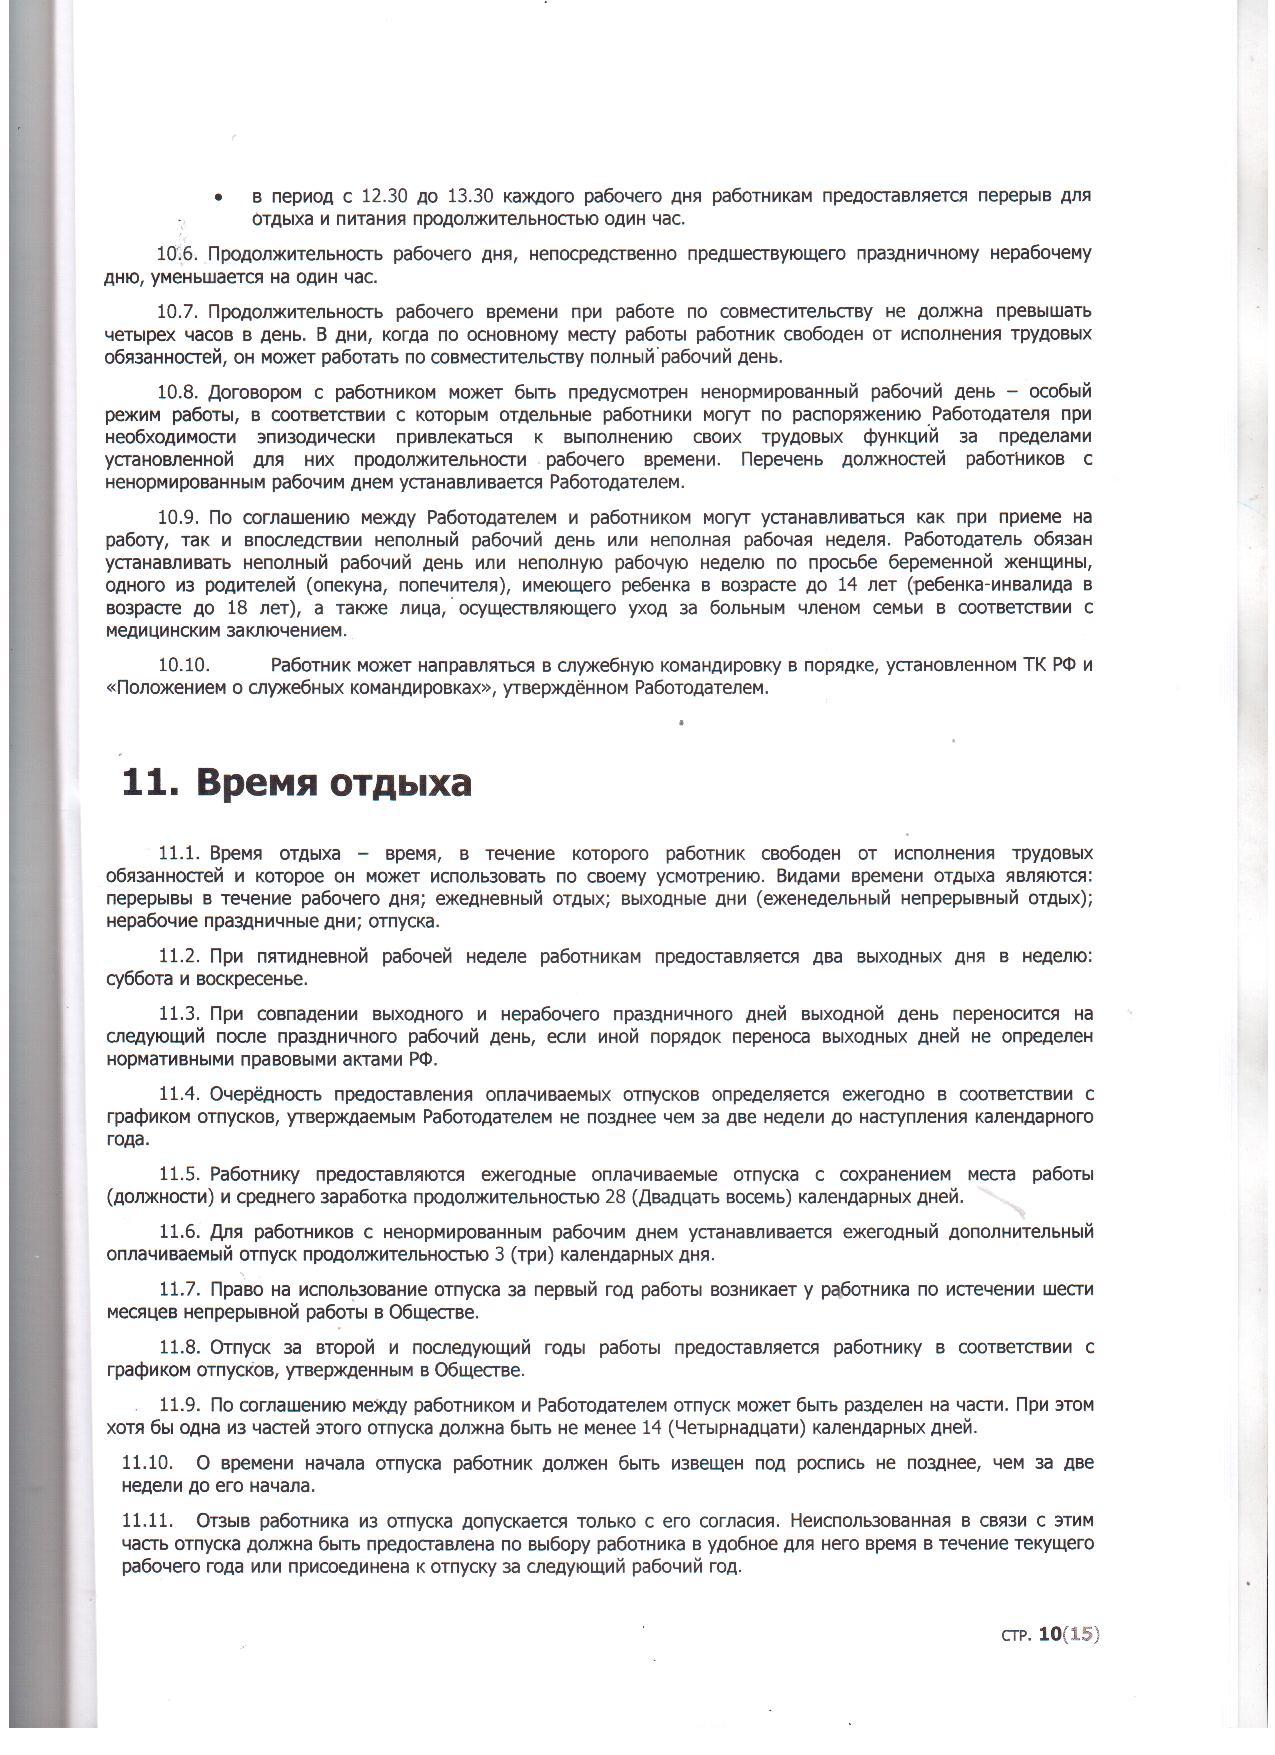 Правила внутреннего трудоговоро распорядка 10